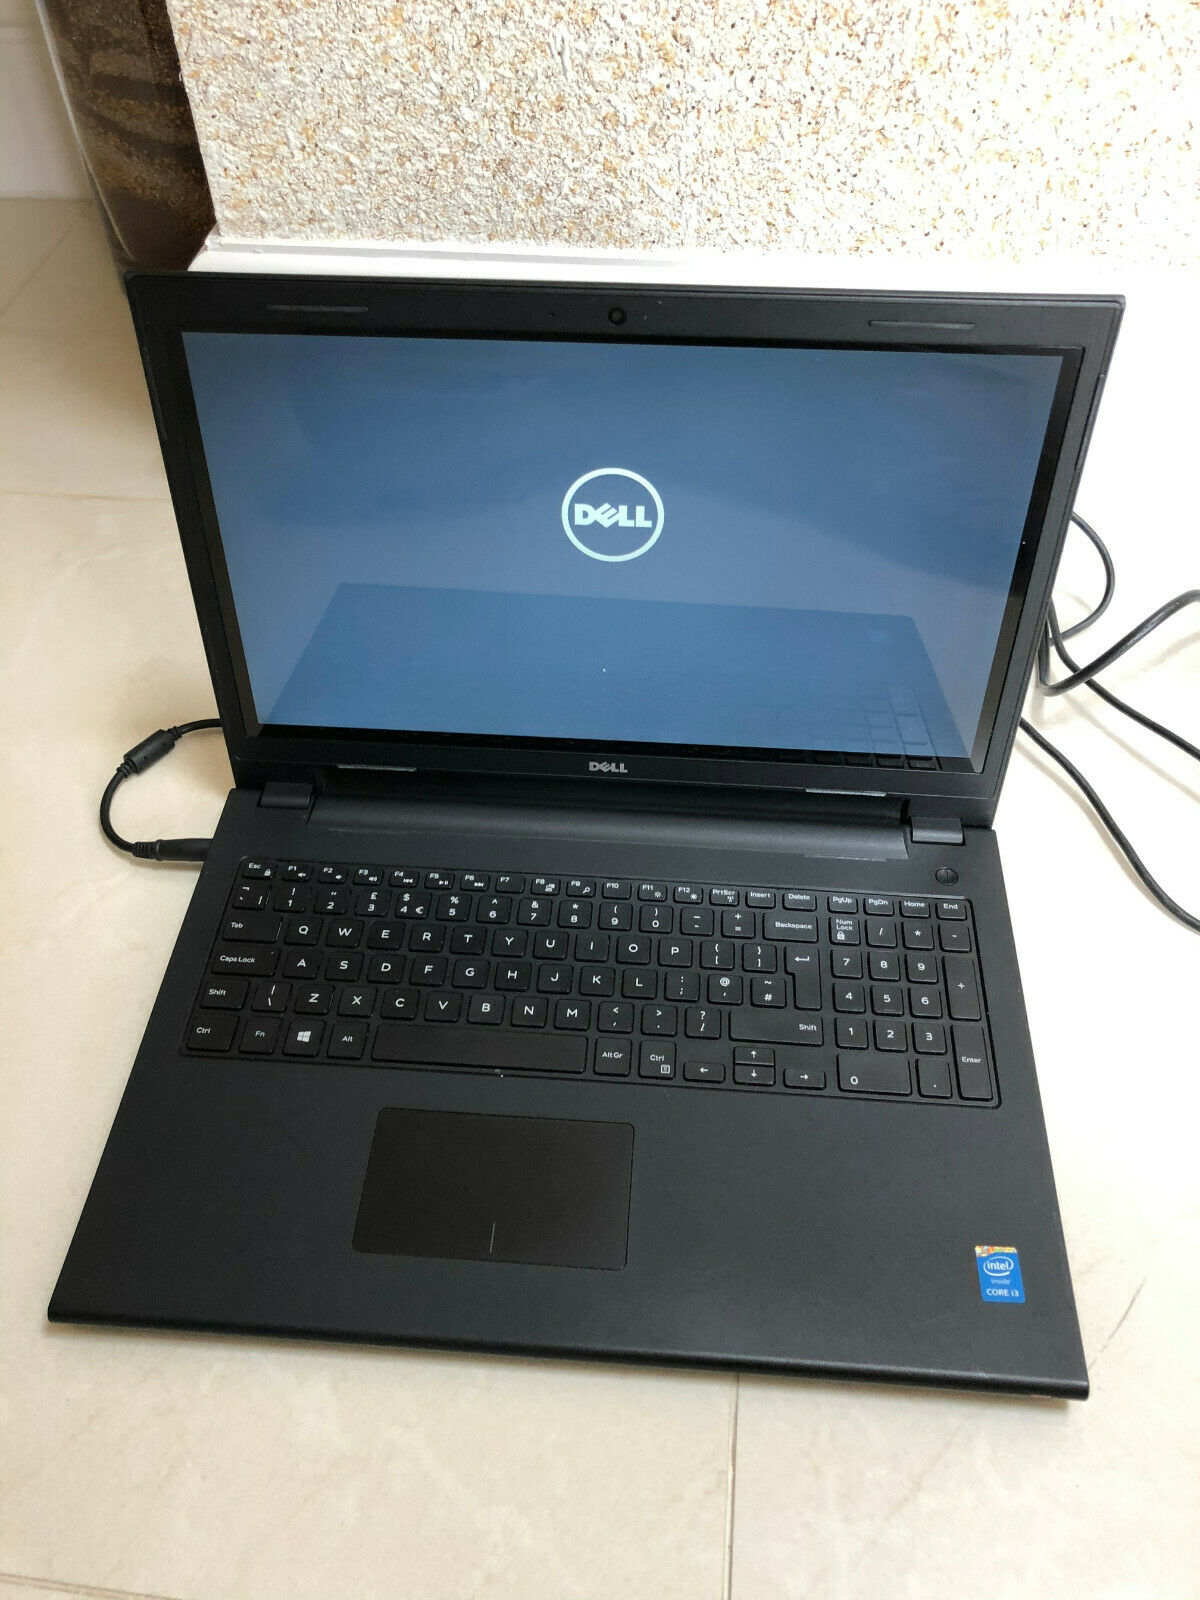 Laptop Windows - Dell Inspiron 15 Laptop  -  Windows 10 - Intel Core i3 - 4GB RAM - 500GB HD